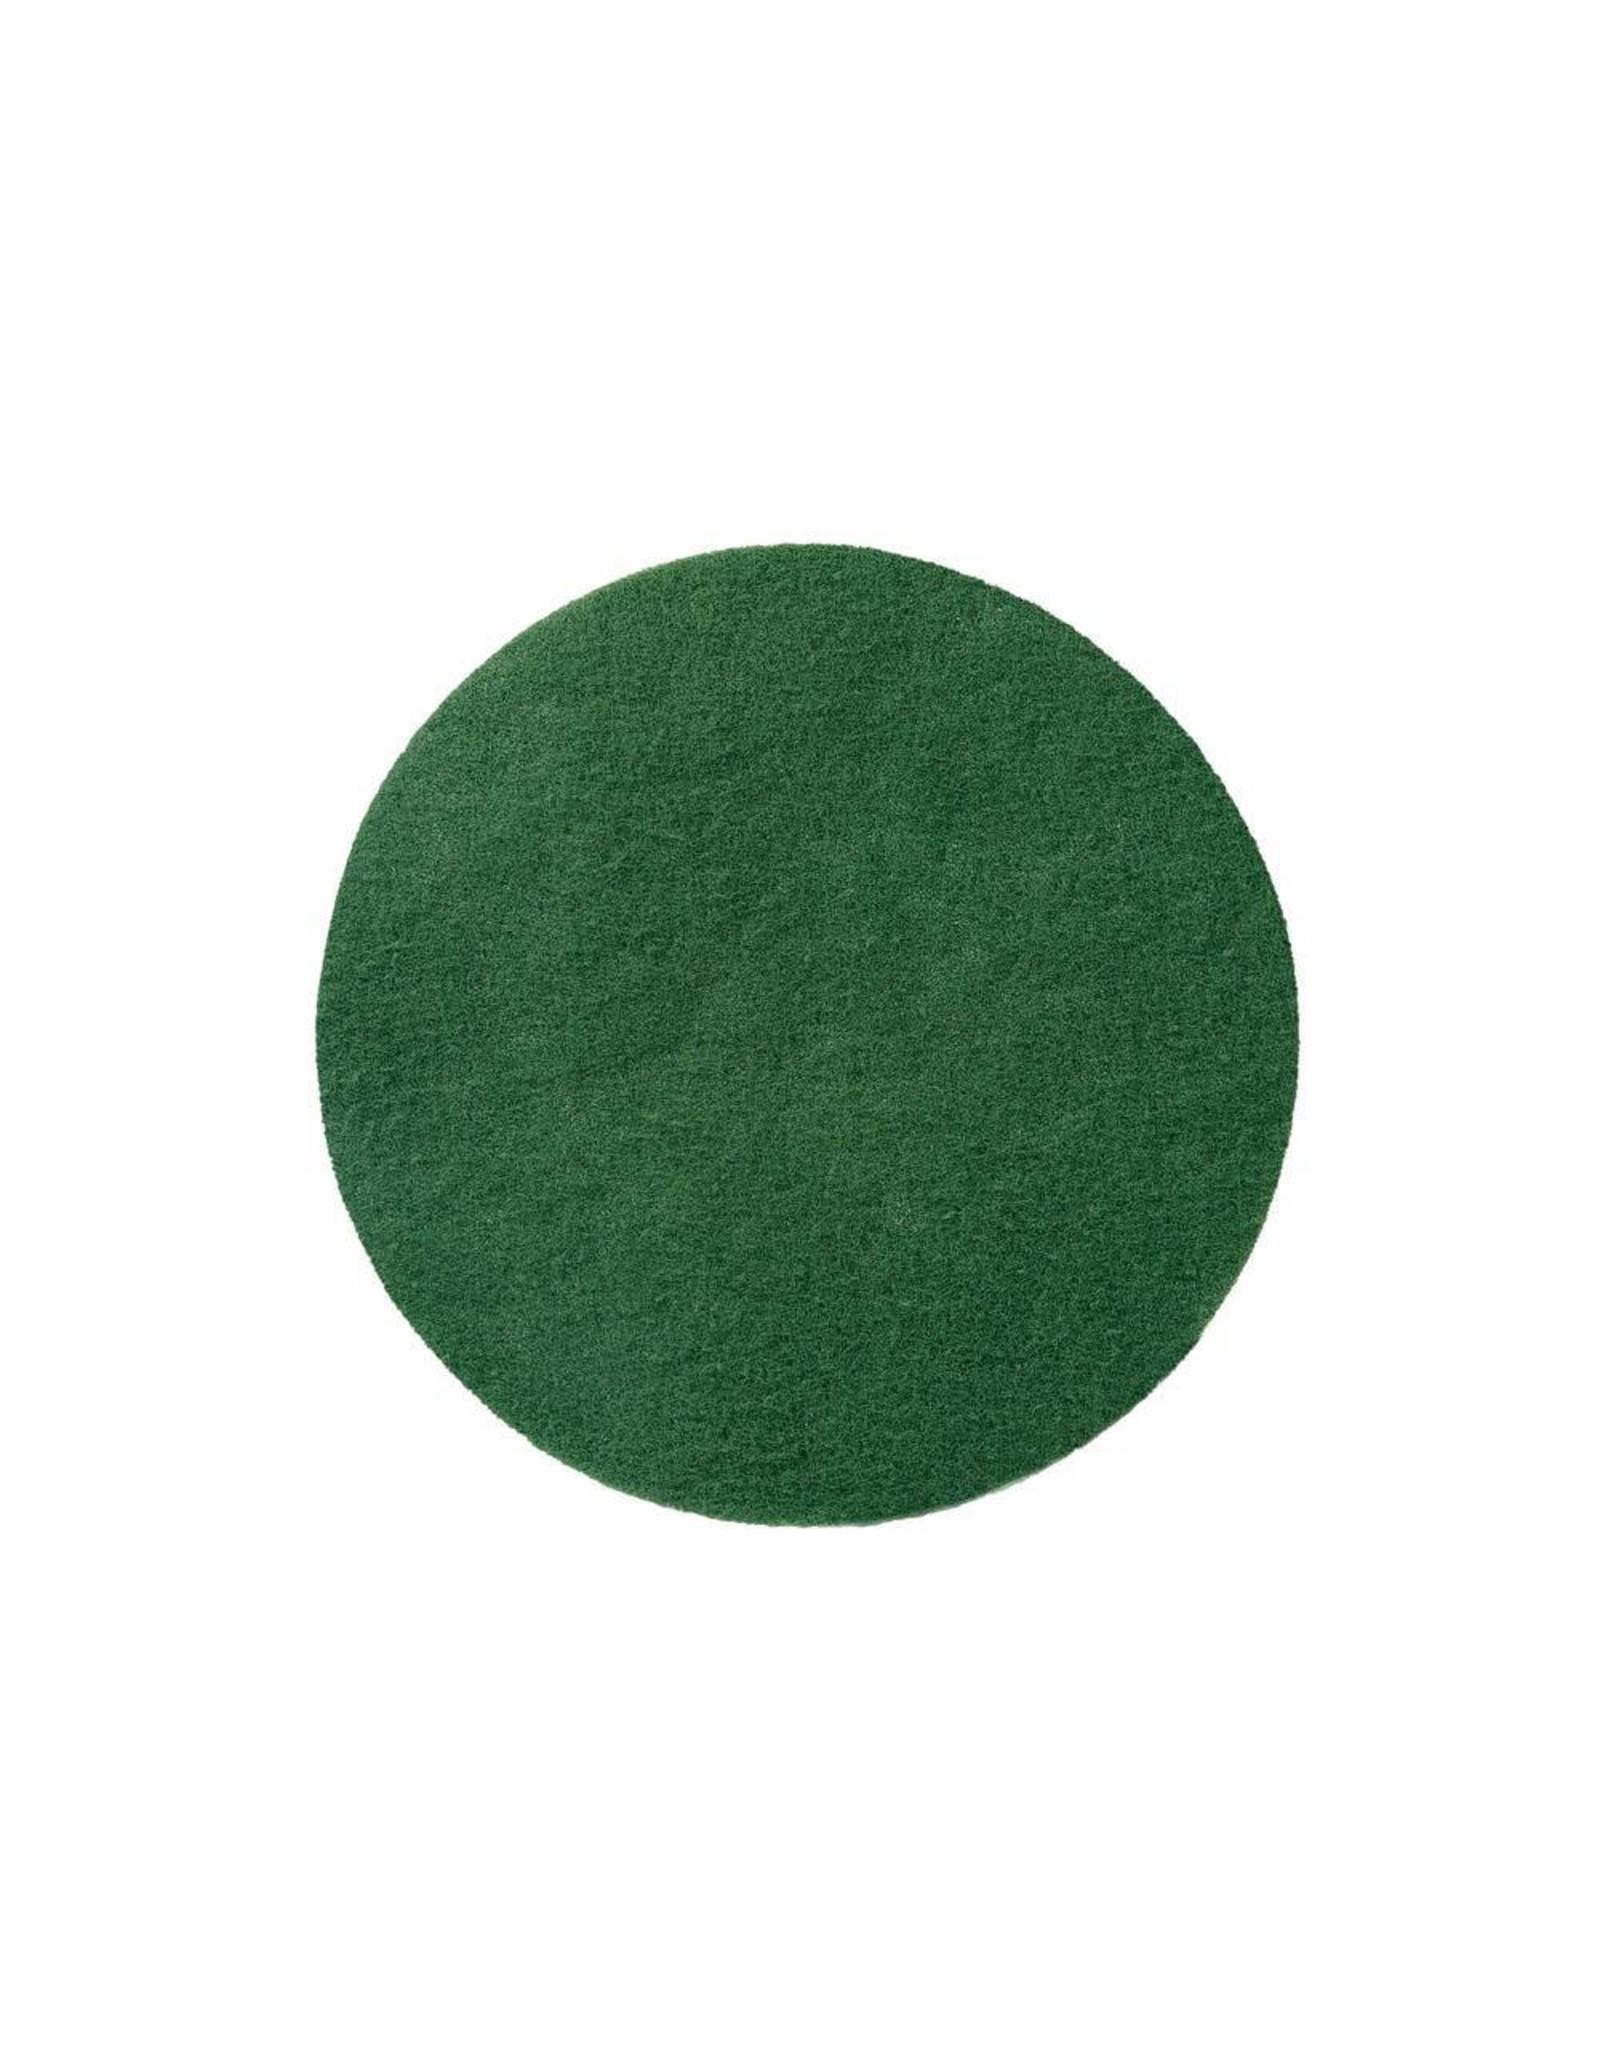 ACOR Nylon Pads Groen - 40 CM, 2 CM, 16 inch (High Quality)